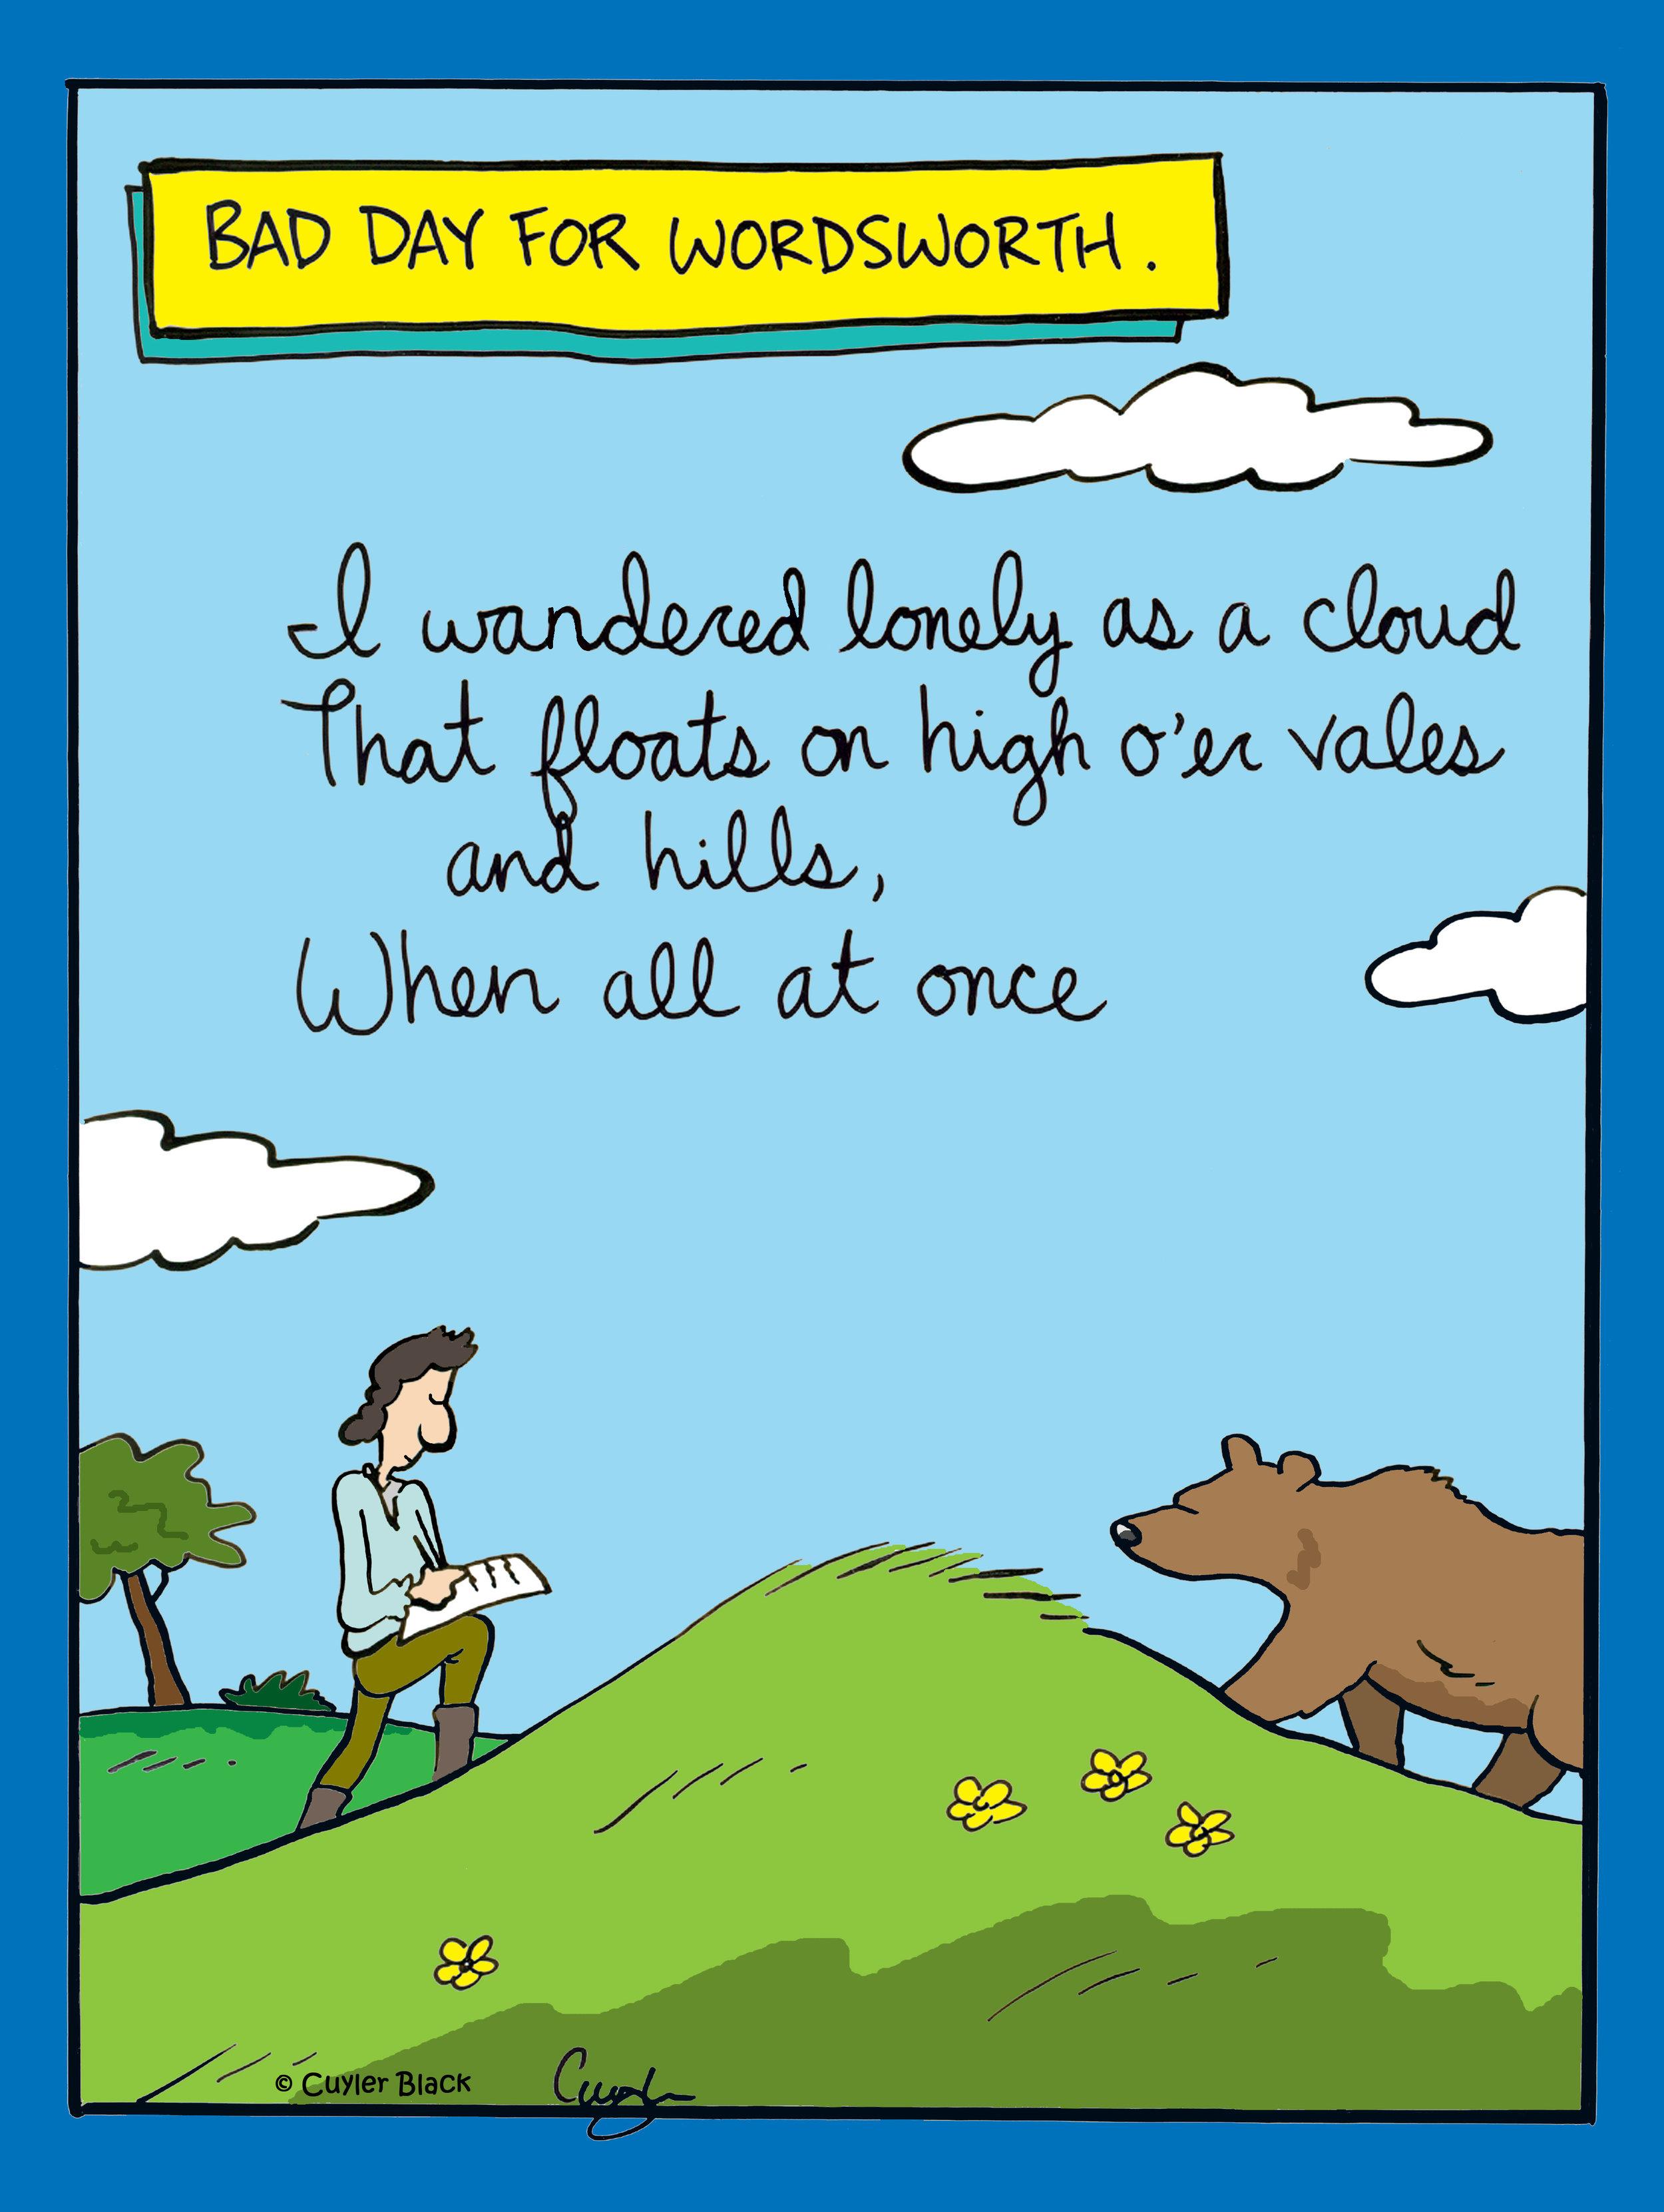 Wordsworth copy.jpg